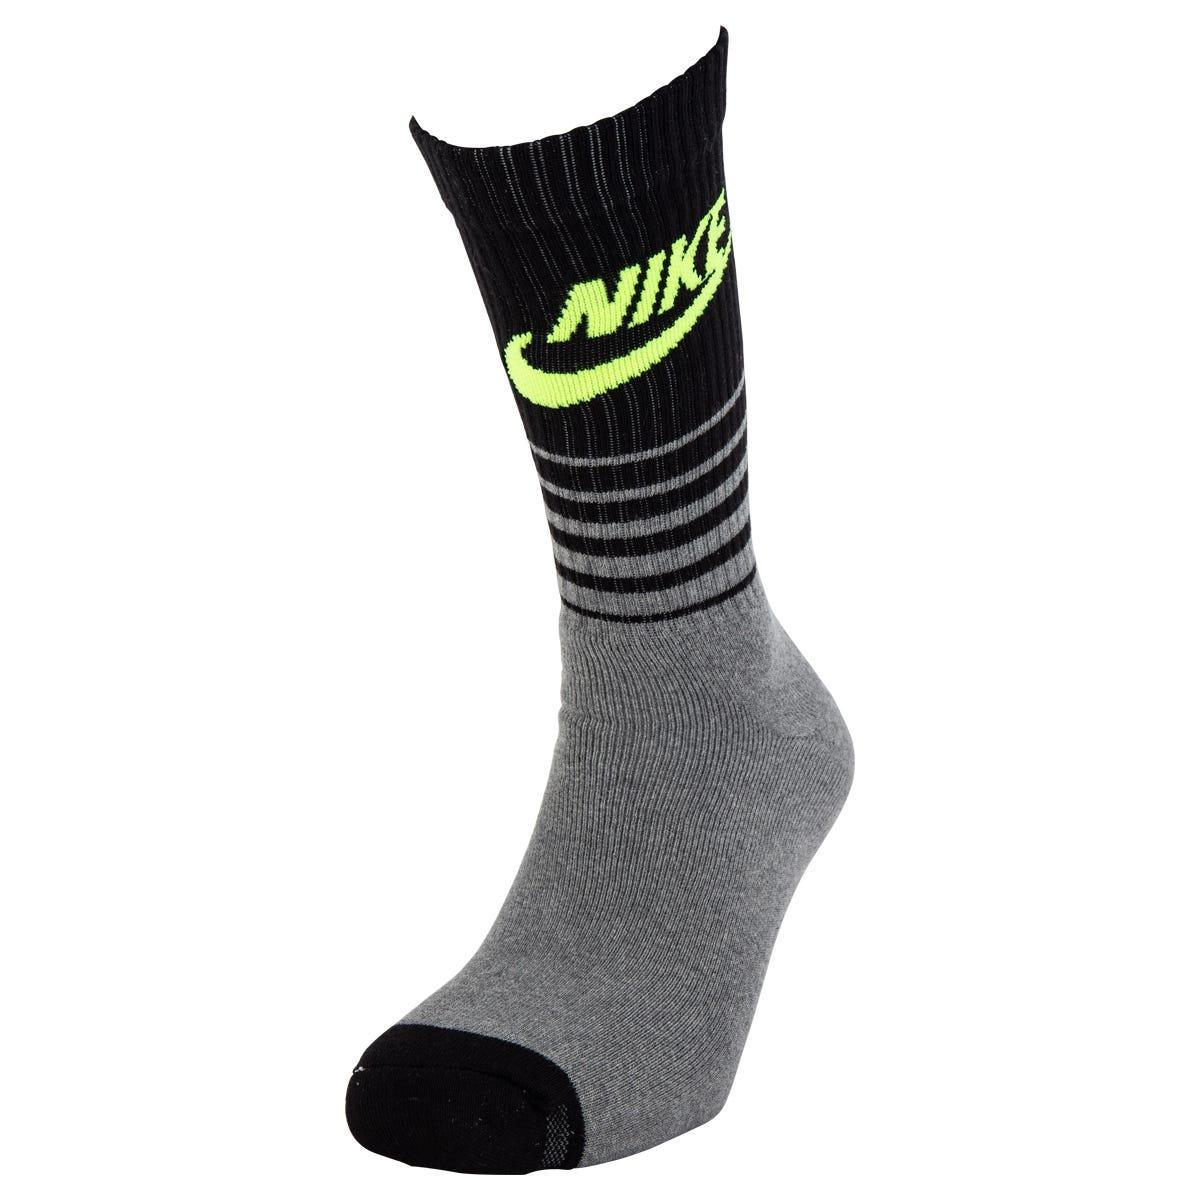 Nike Classic Striped Men's Crew Socks